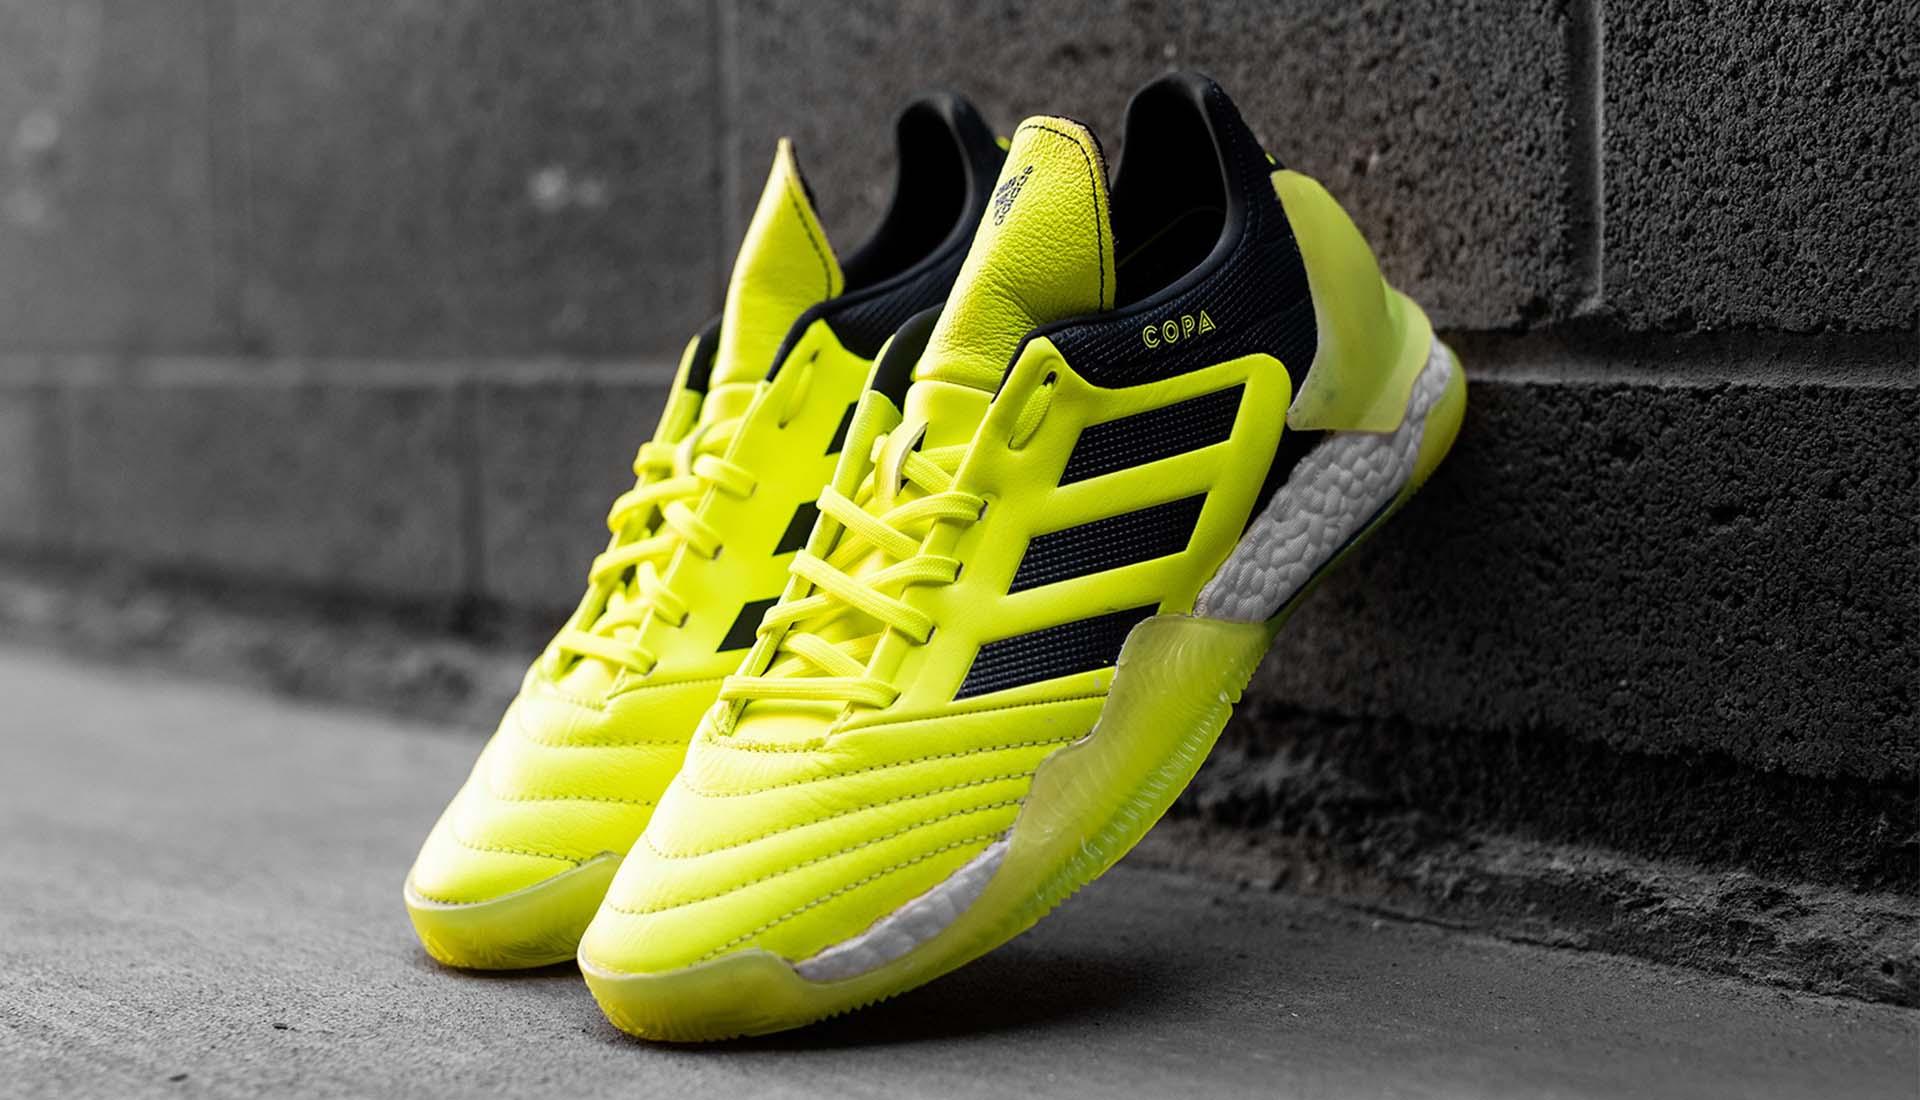 7cf9ff8ba361 The Shoe Surgeon Launches Special Edition adidas COPA Drop - SoccerBible